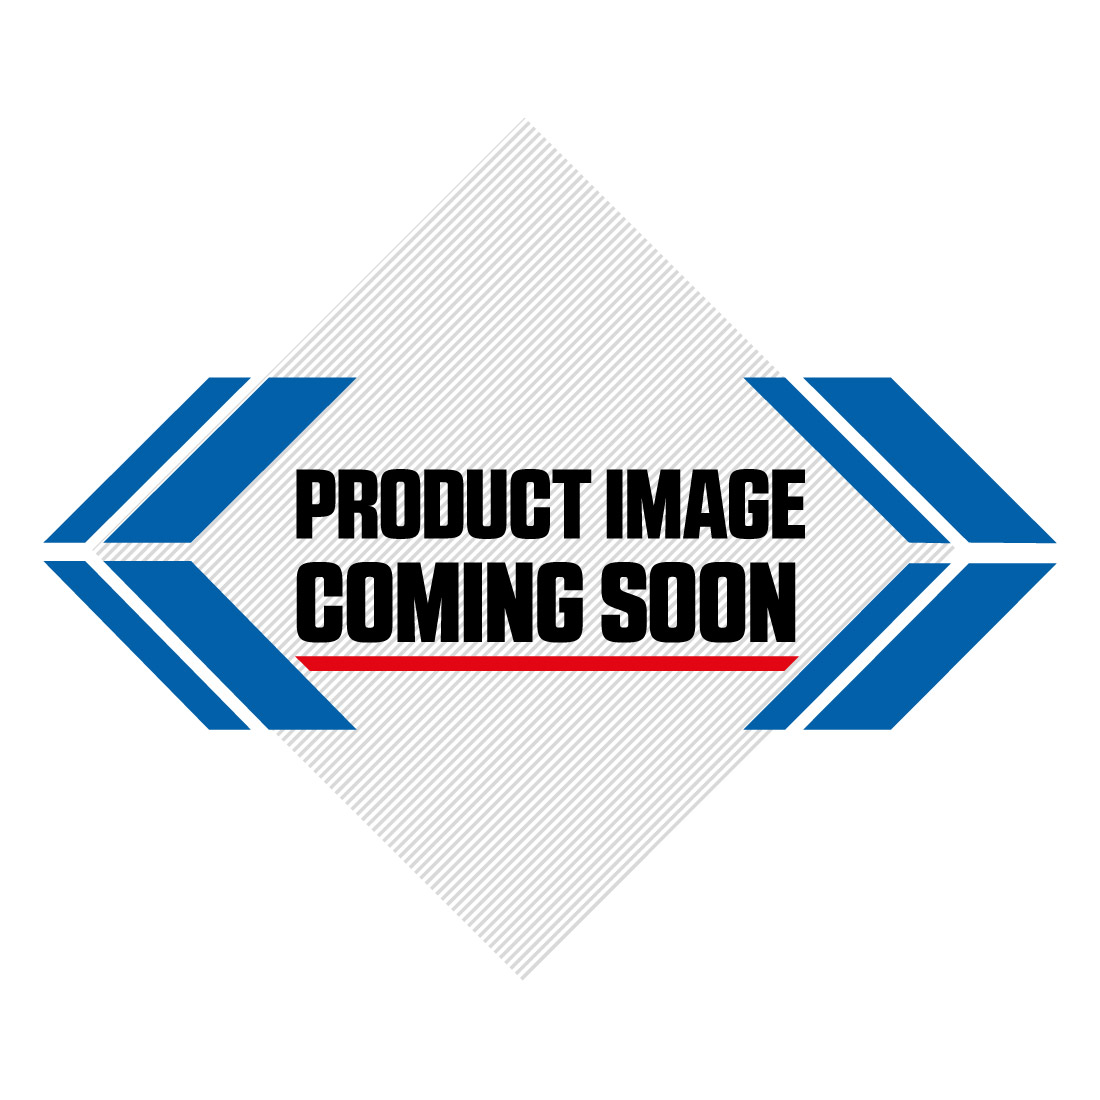 DJI Mavic Pro Fly More Combo 4K Quadcopter Drone Image-6